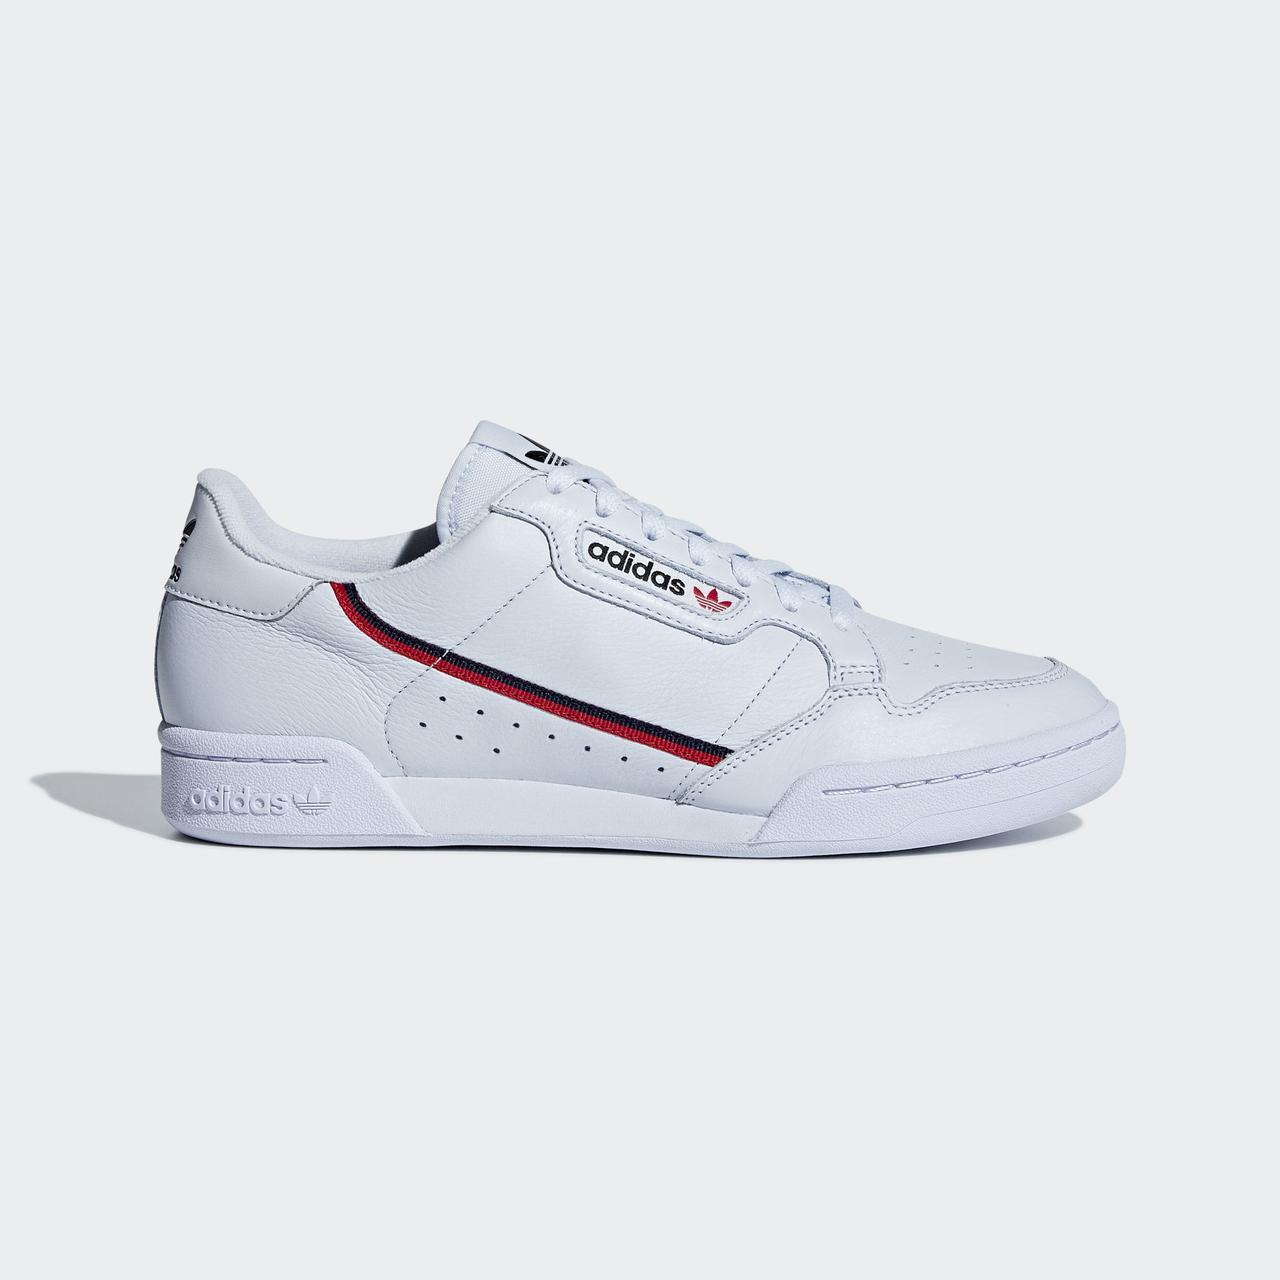 Мужские кроссовки Adidas Originals Continental 80 (Артикул: B41673)